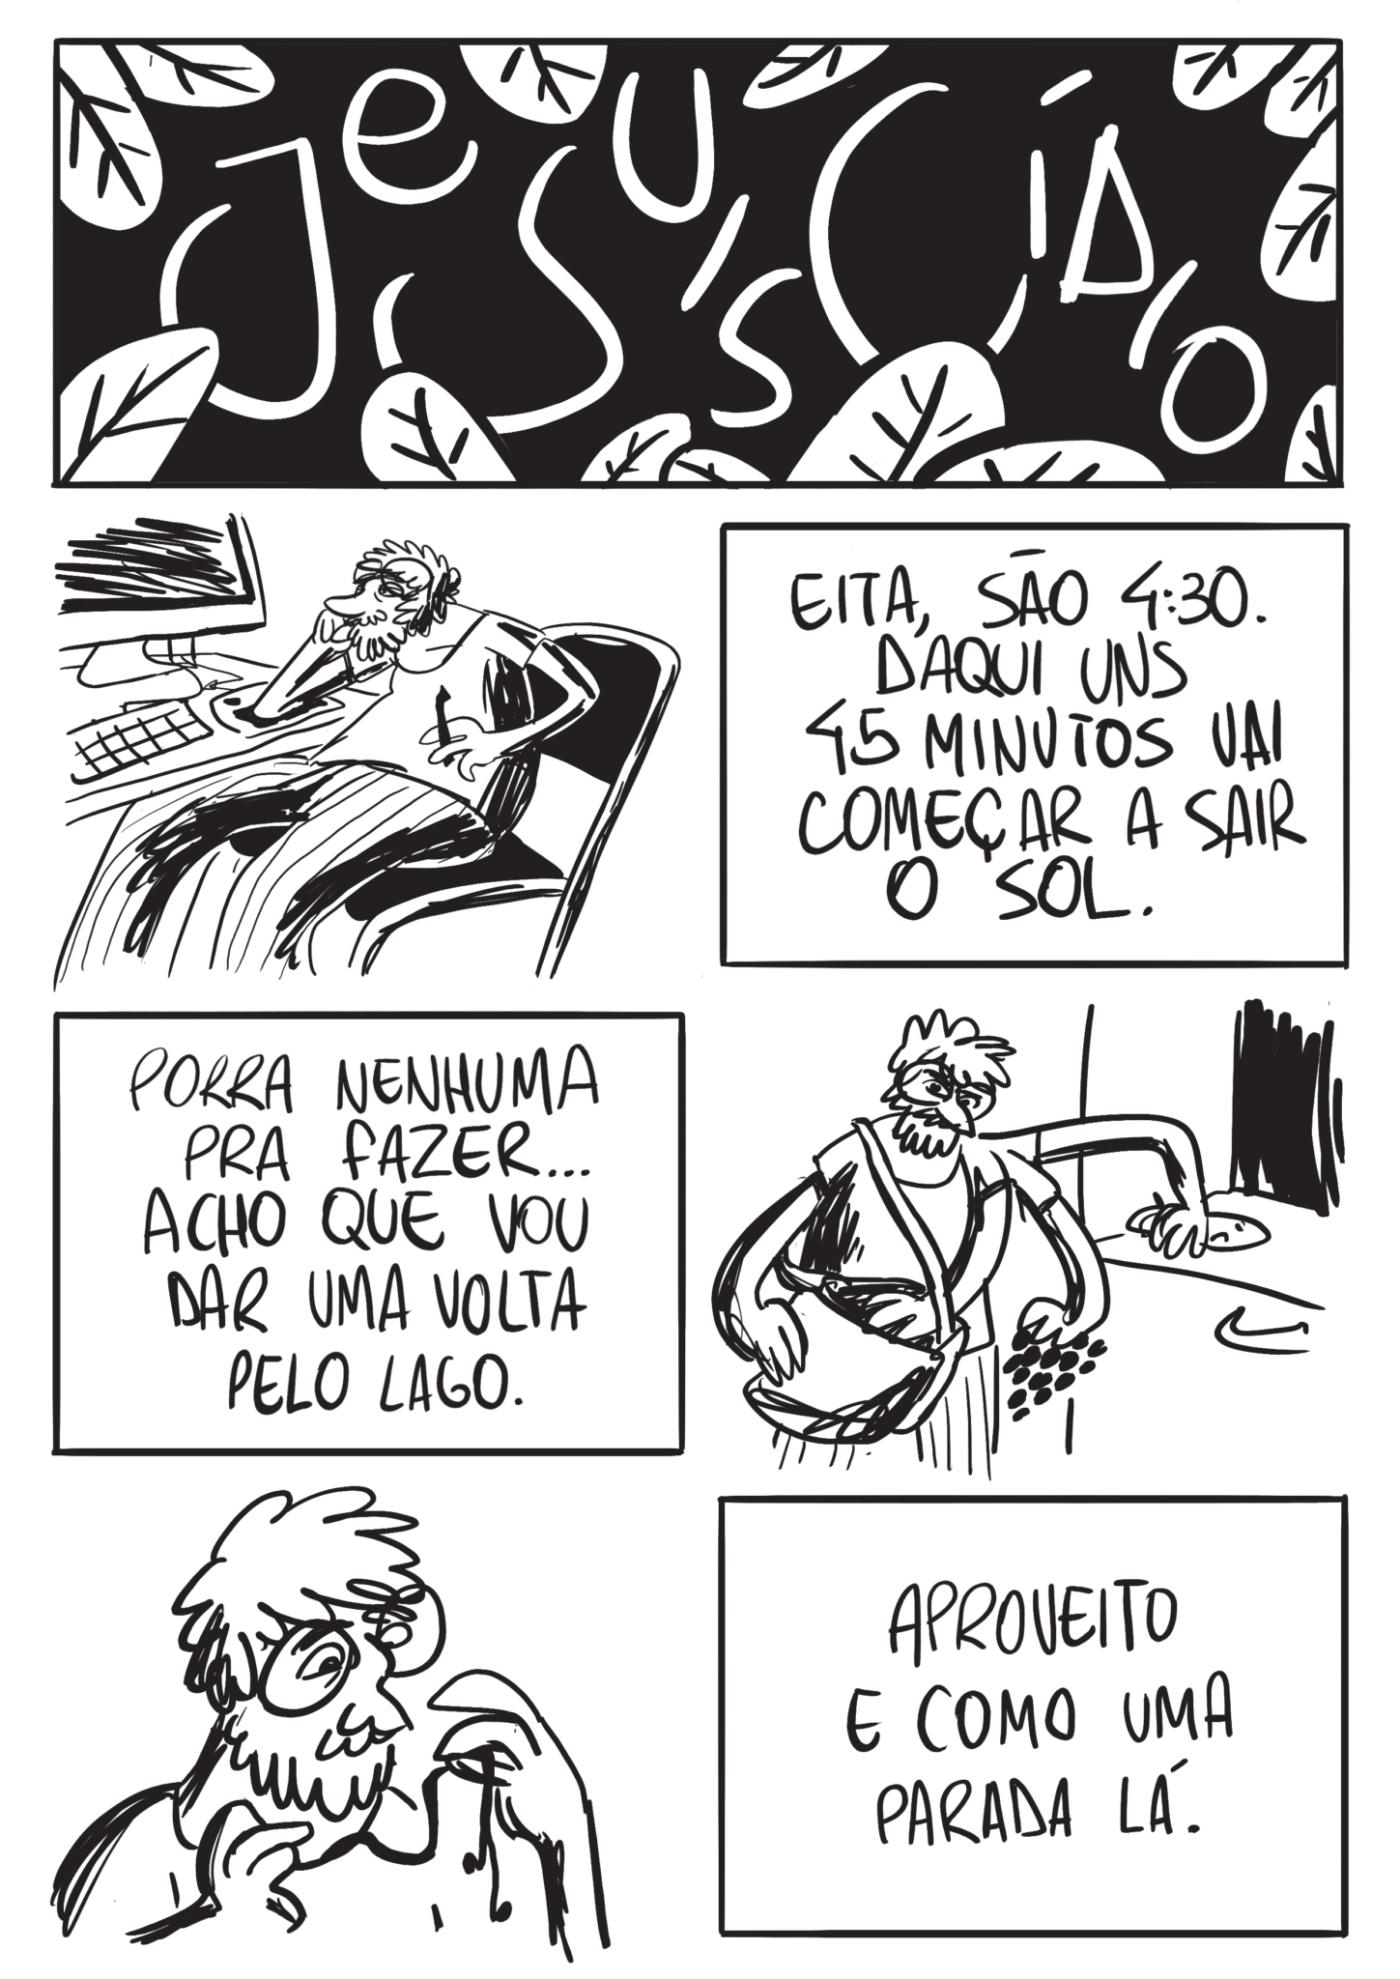 Je Suis Cídio #16, por João B. Godoi